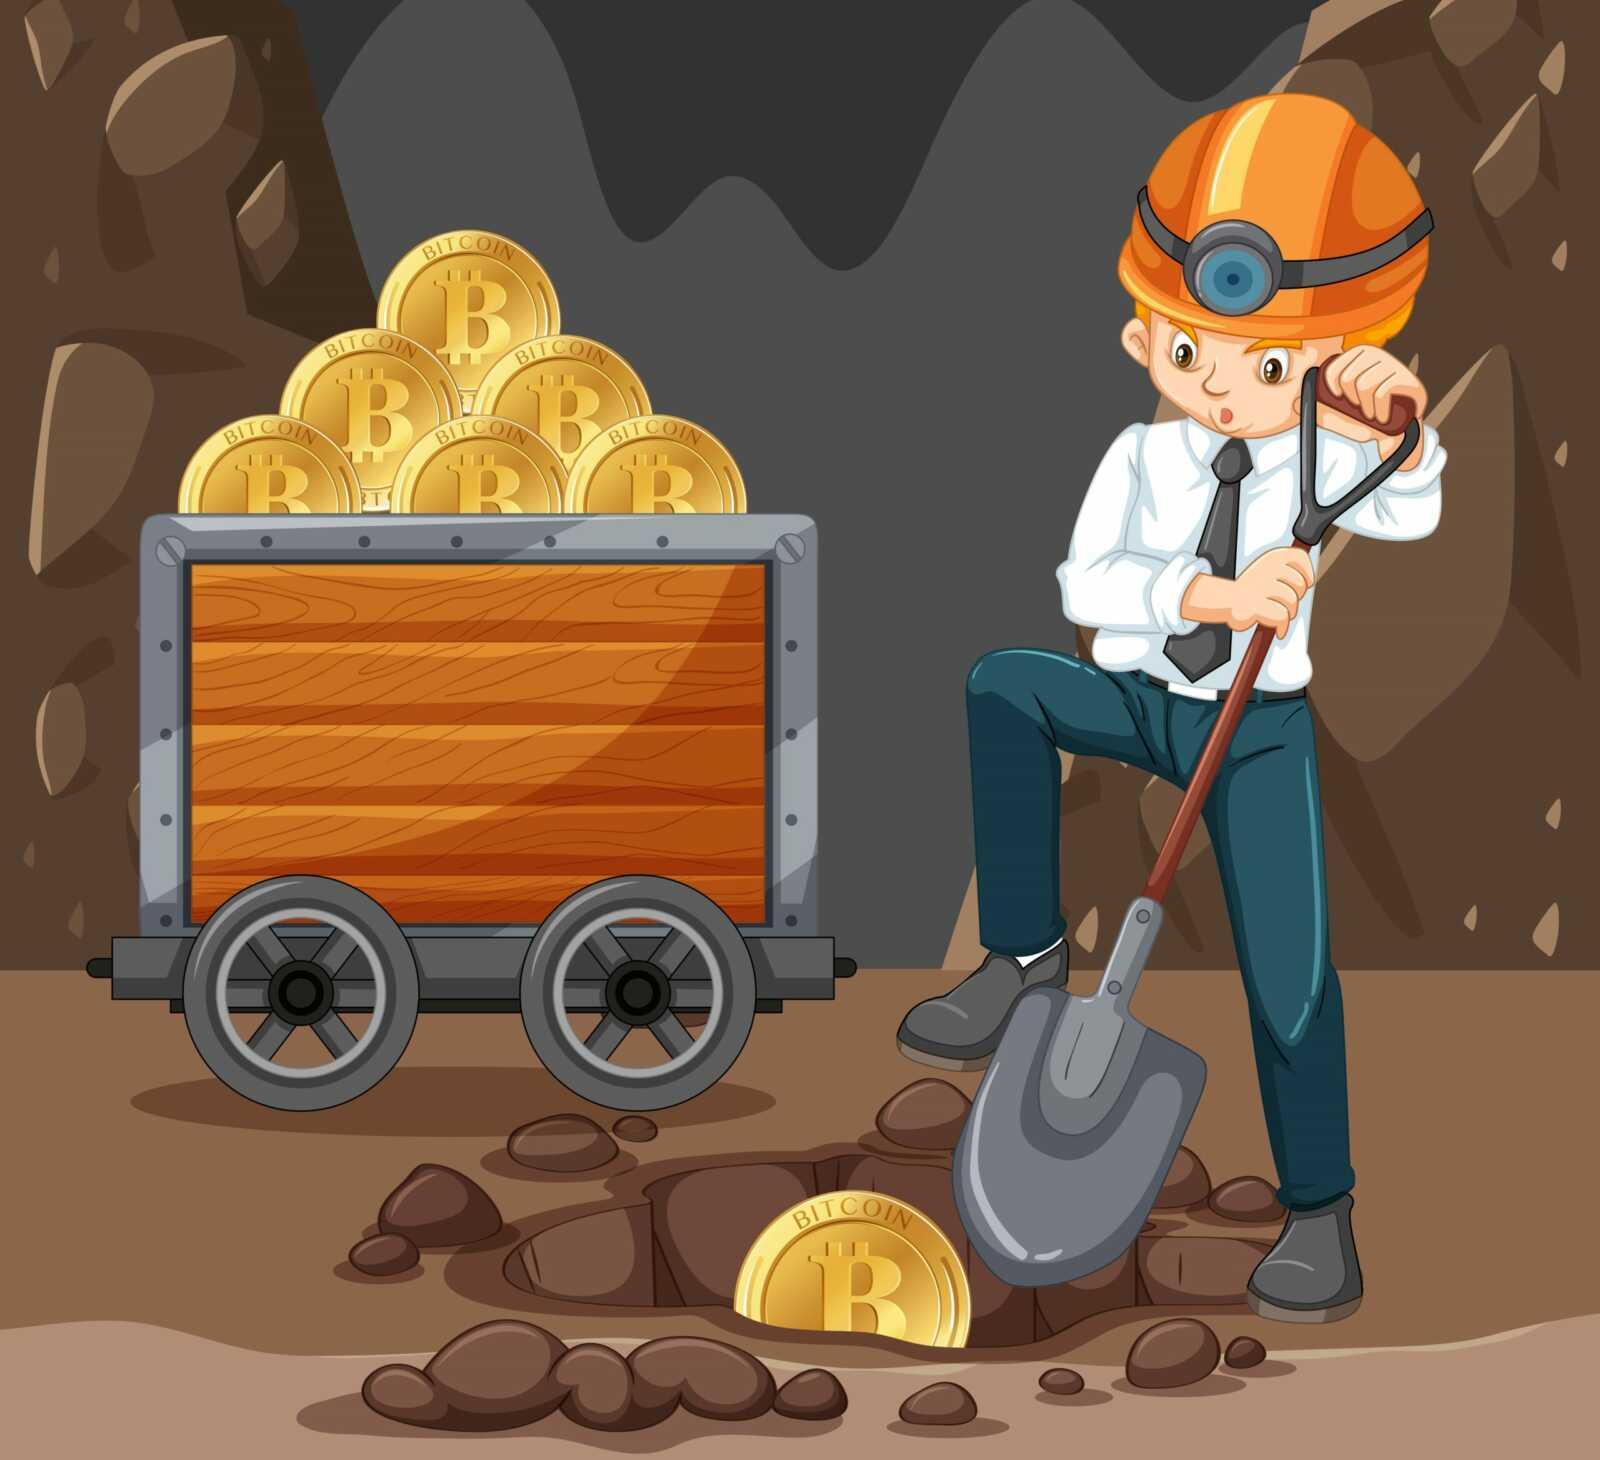 bitcoin madencileri kar realizasyonuna gecti 6021192644d86 scaled